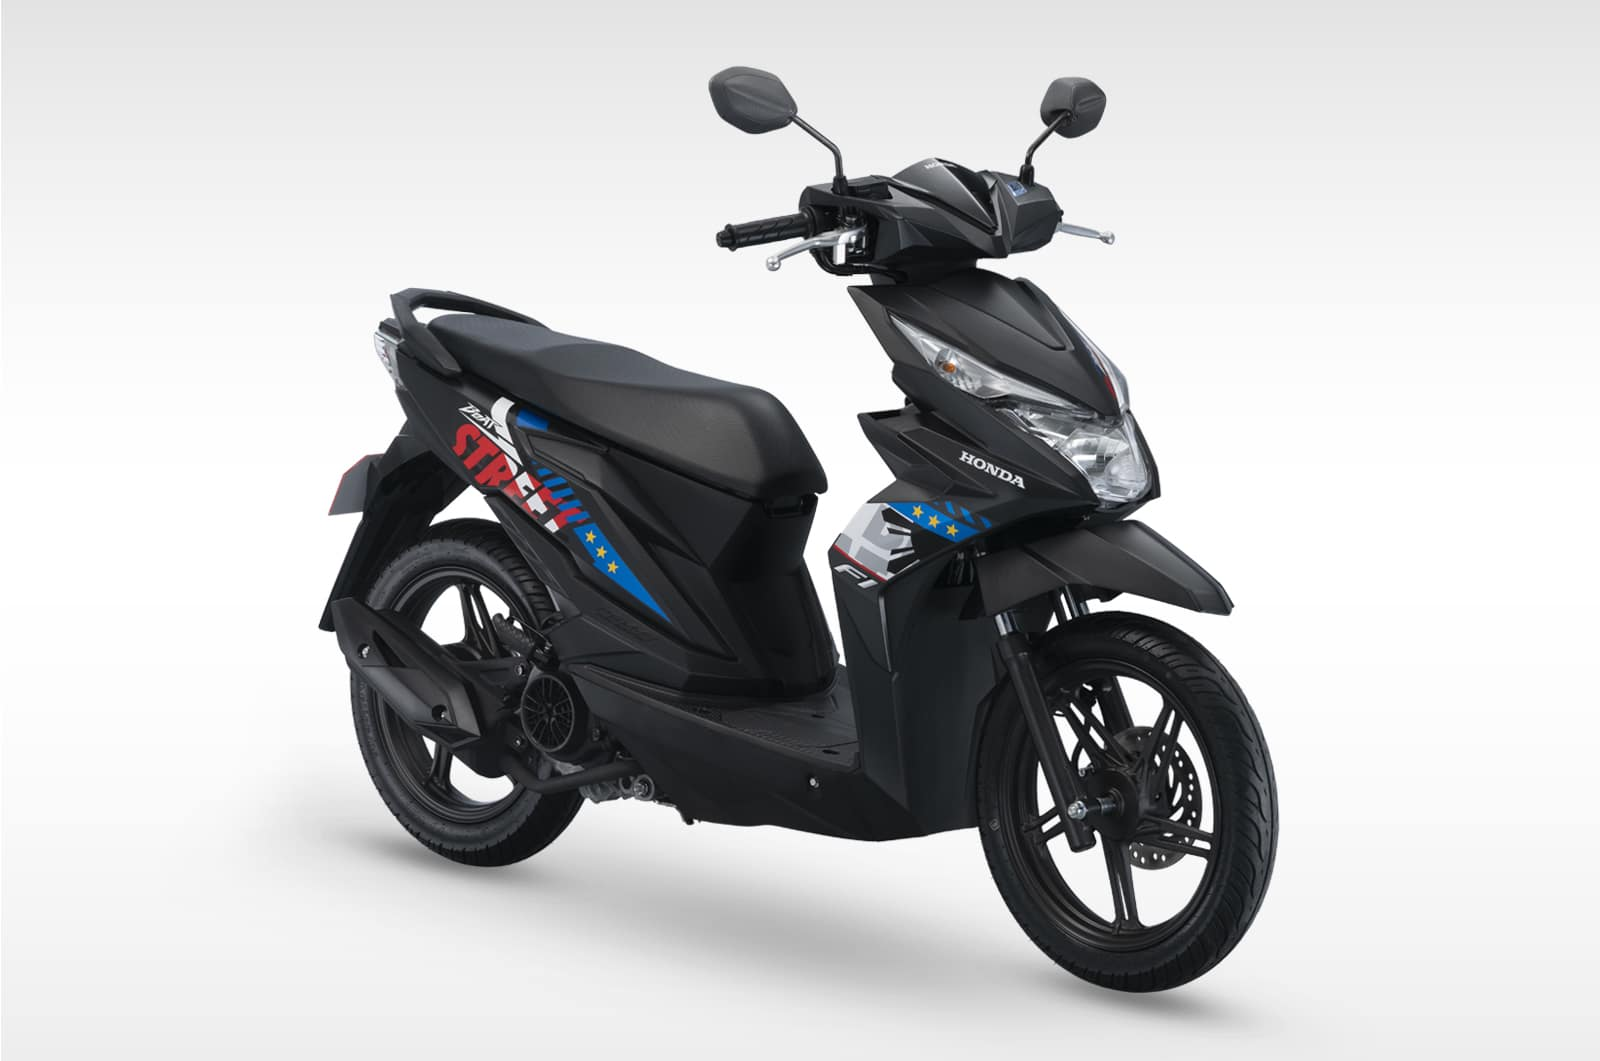 New Honda Beat Fi STD (ACH110CSFL/CSFLII)